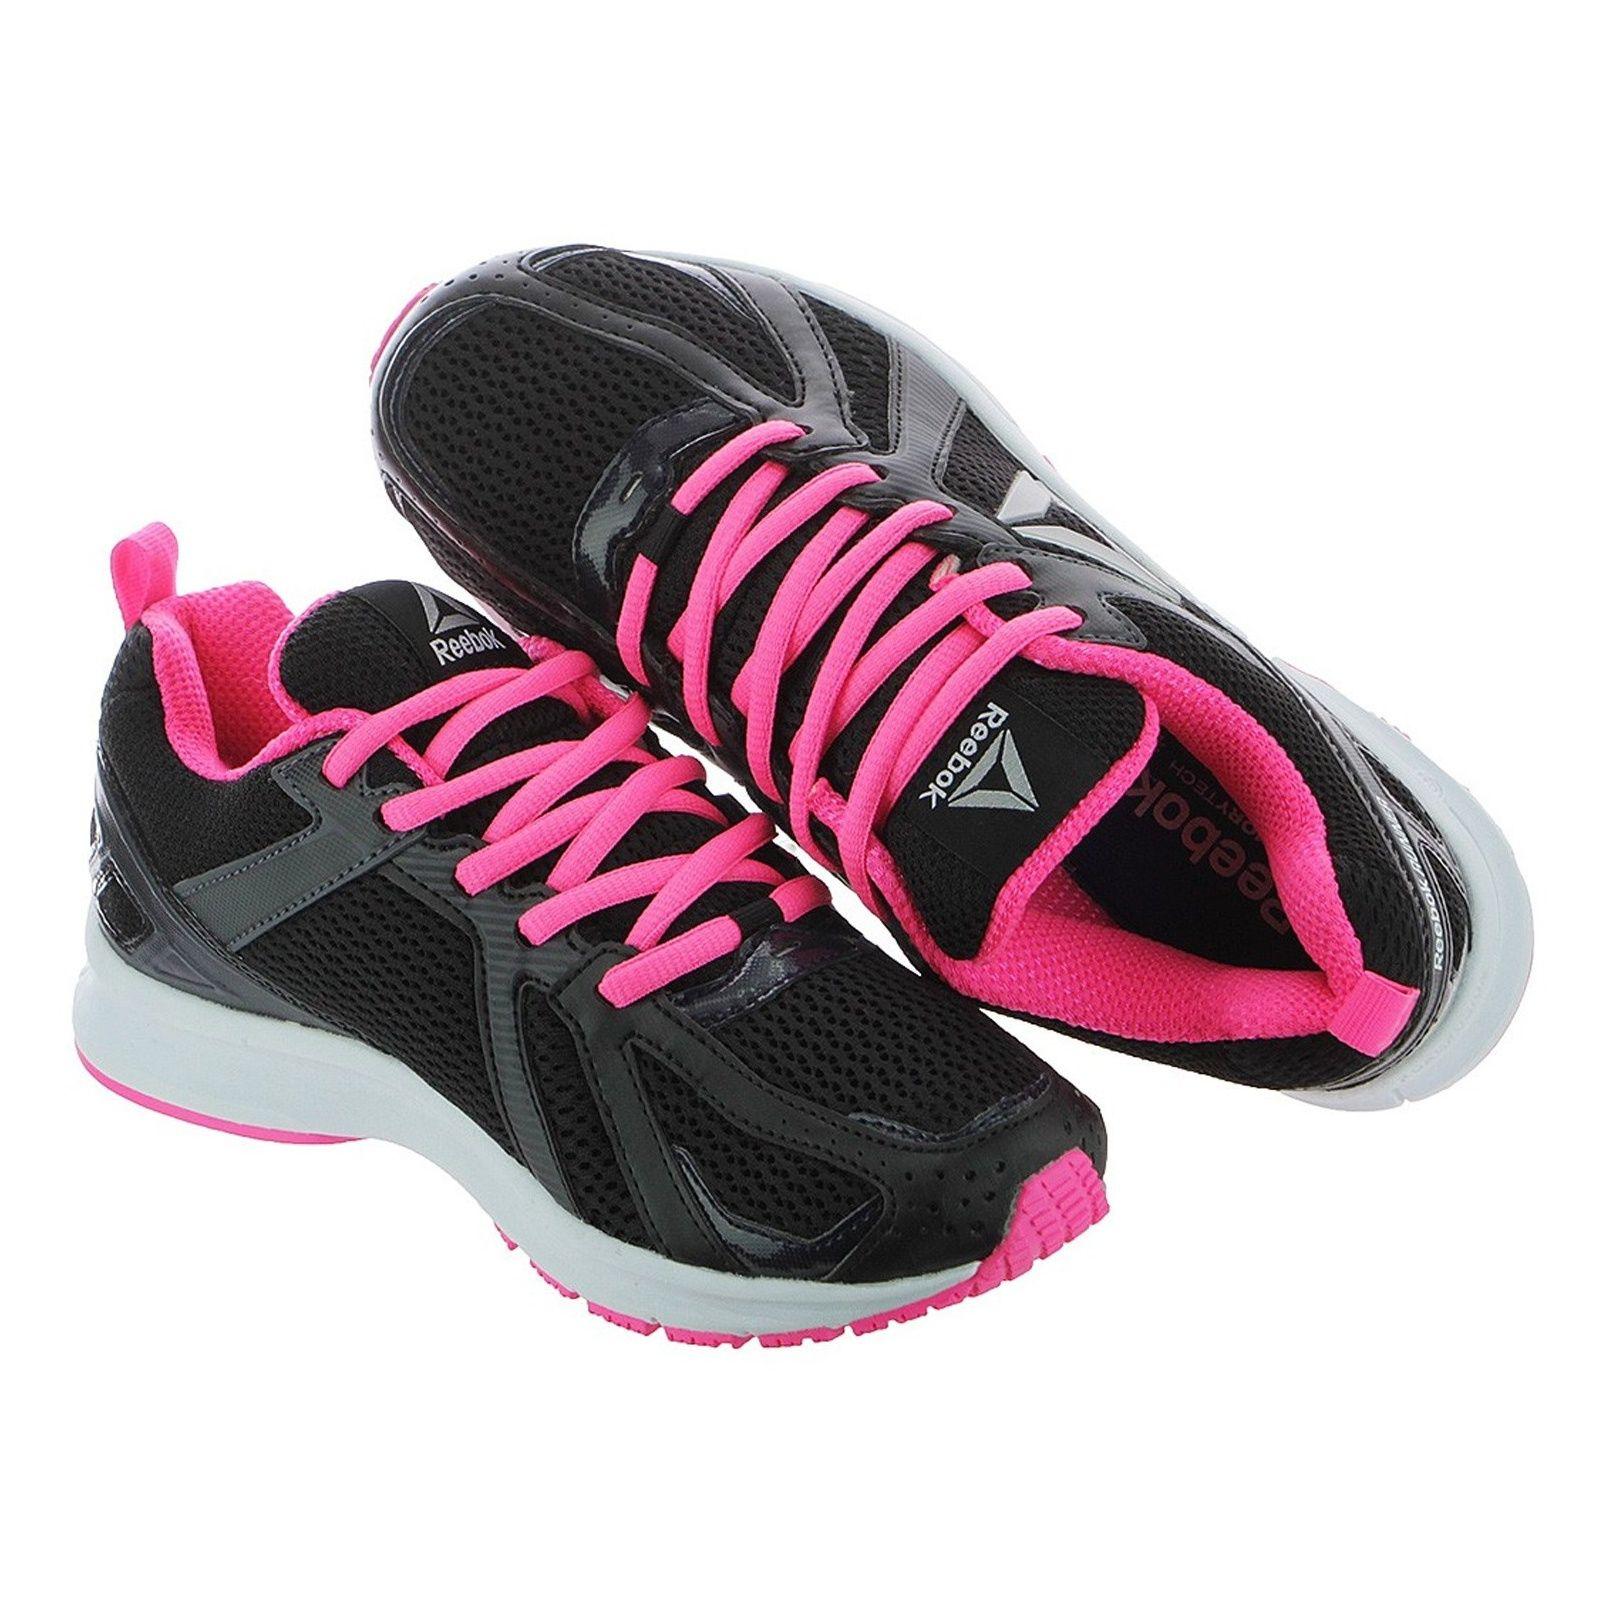 کفش دویدن زنانه Runner MT - ریباک - مشکي - 3